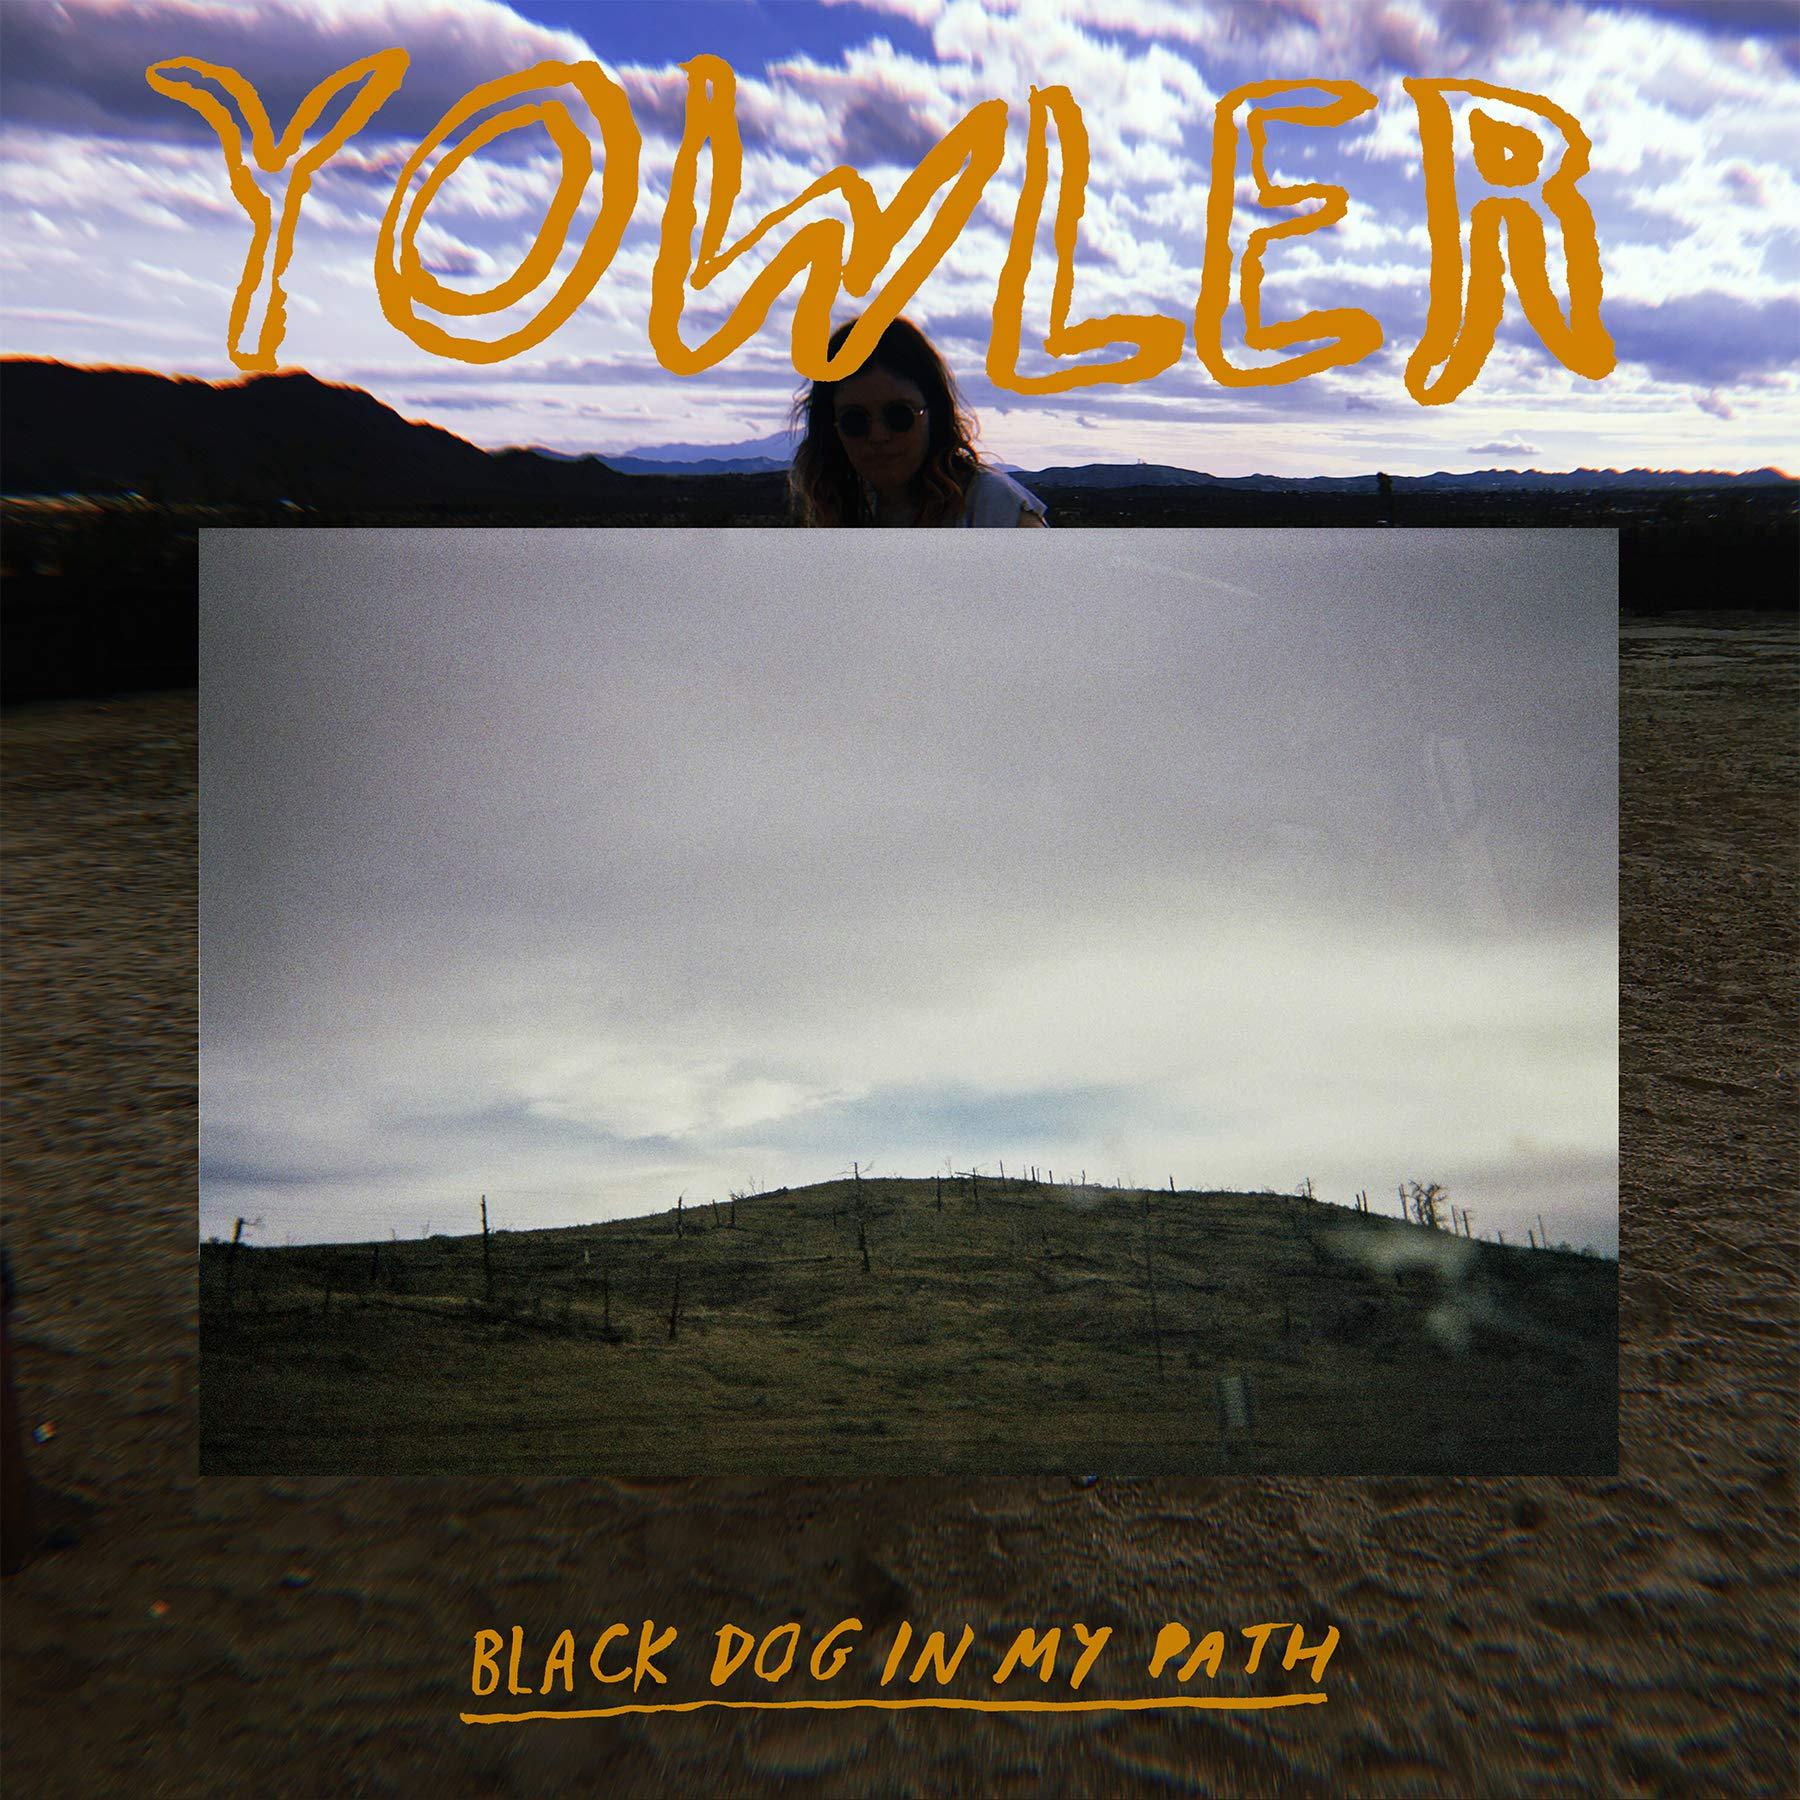 Vinilo : Yowler - Black Dog In My Path (LP Vinyl)